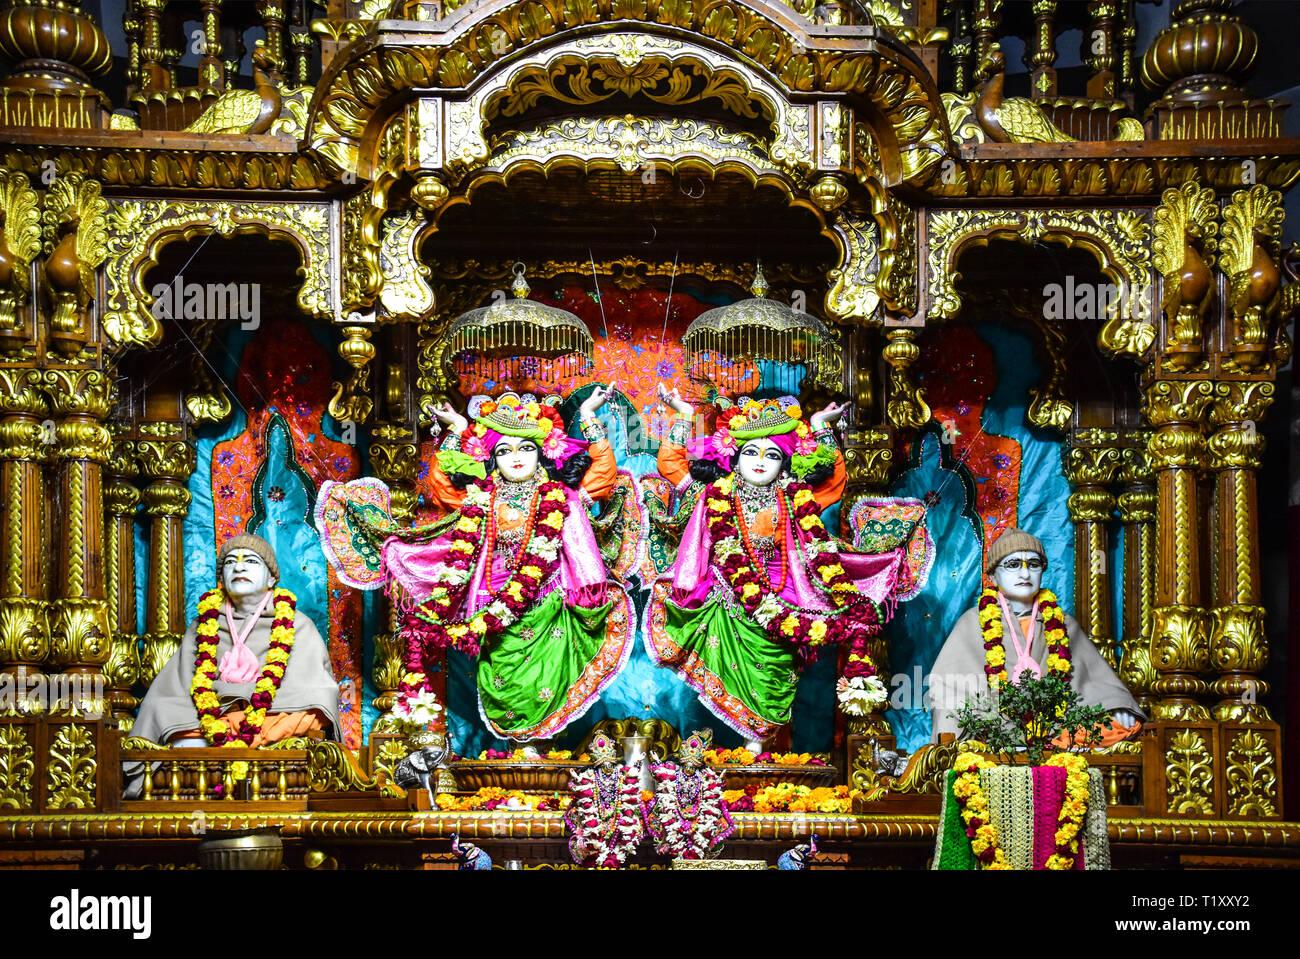 ISKCON Temple, Hare Krishna Hills,  Delhi, India Stock Photo